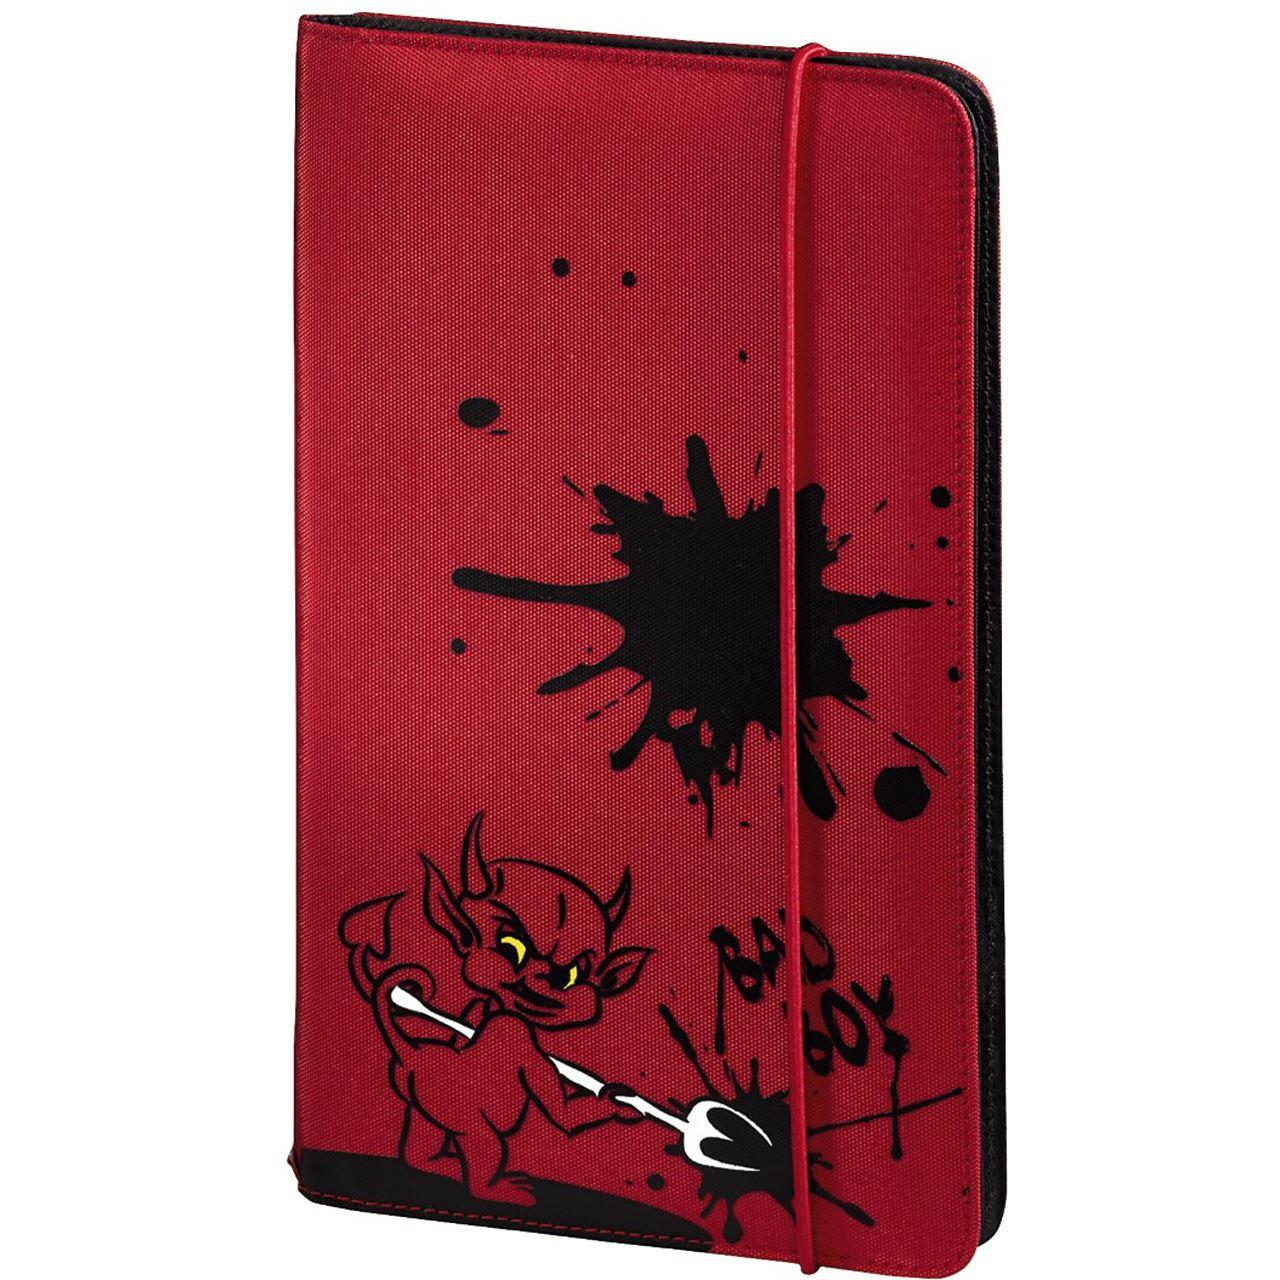 hama cd dvd blu ray up to fashion 48 rot tasche f r aufbewahrung 00095672. Black Bedroom Furniture Sets. Home Design Ideas